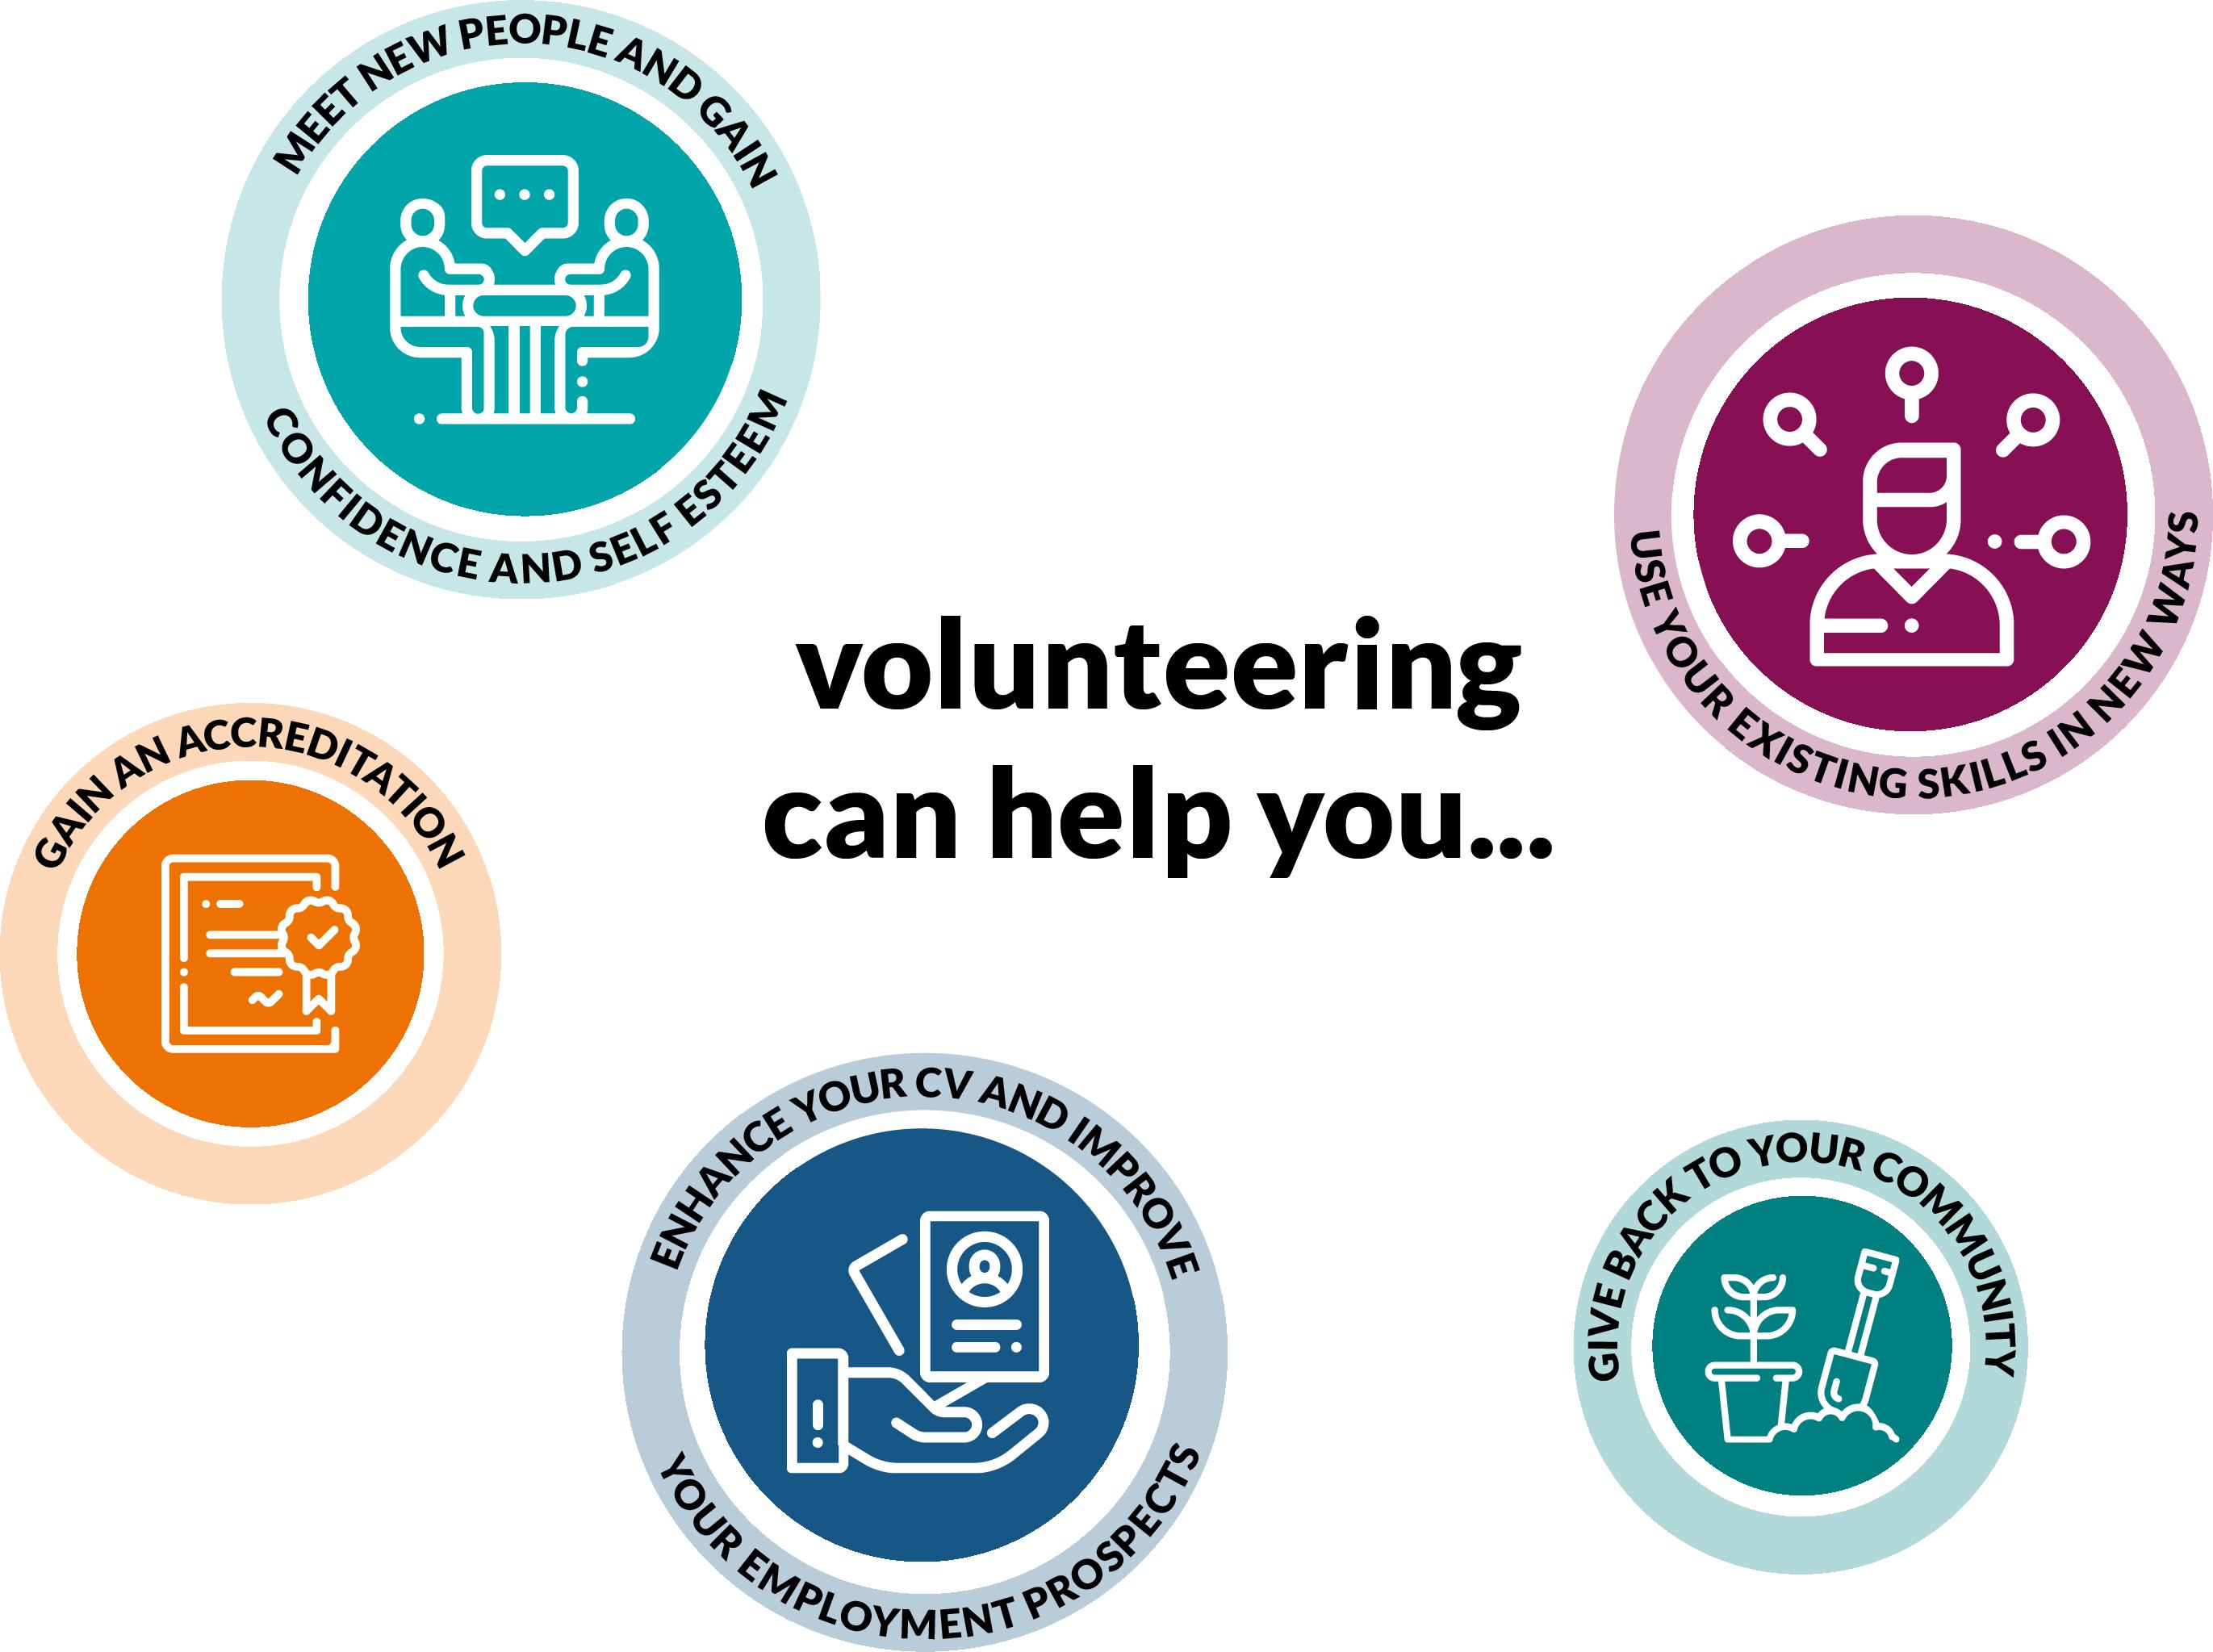 Volunteering can help you...